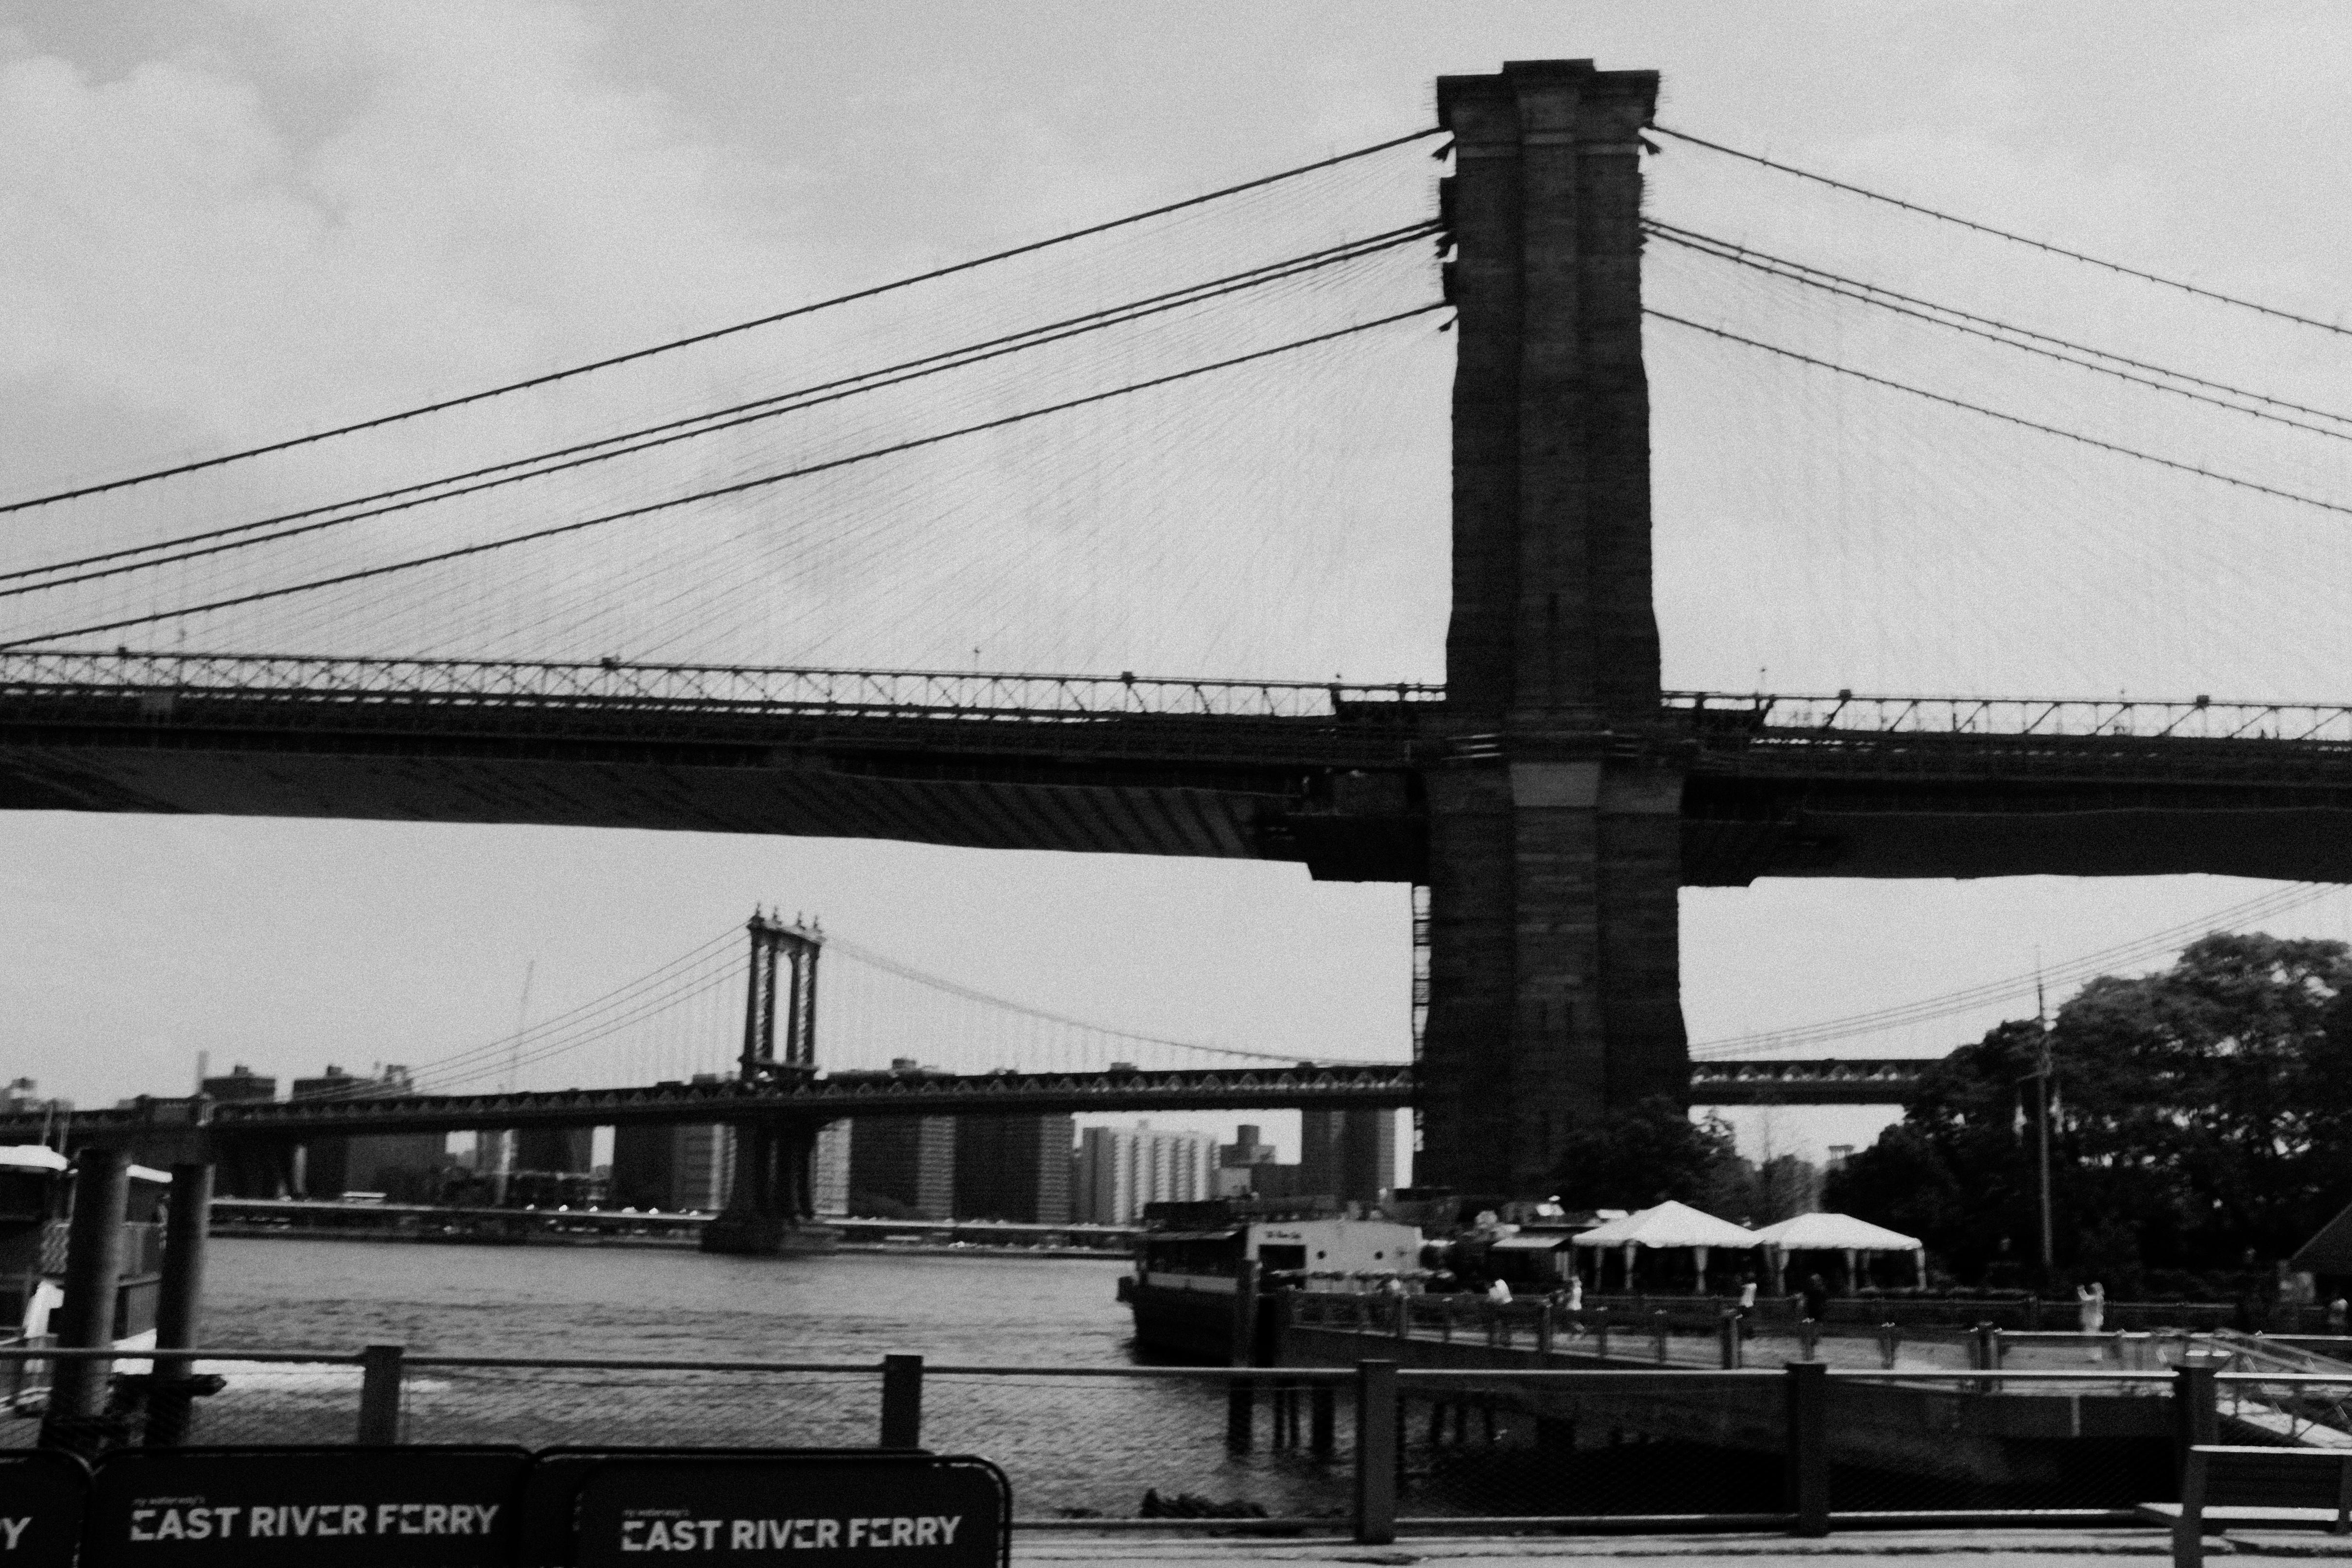 newyork-melissamilis-180